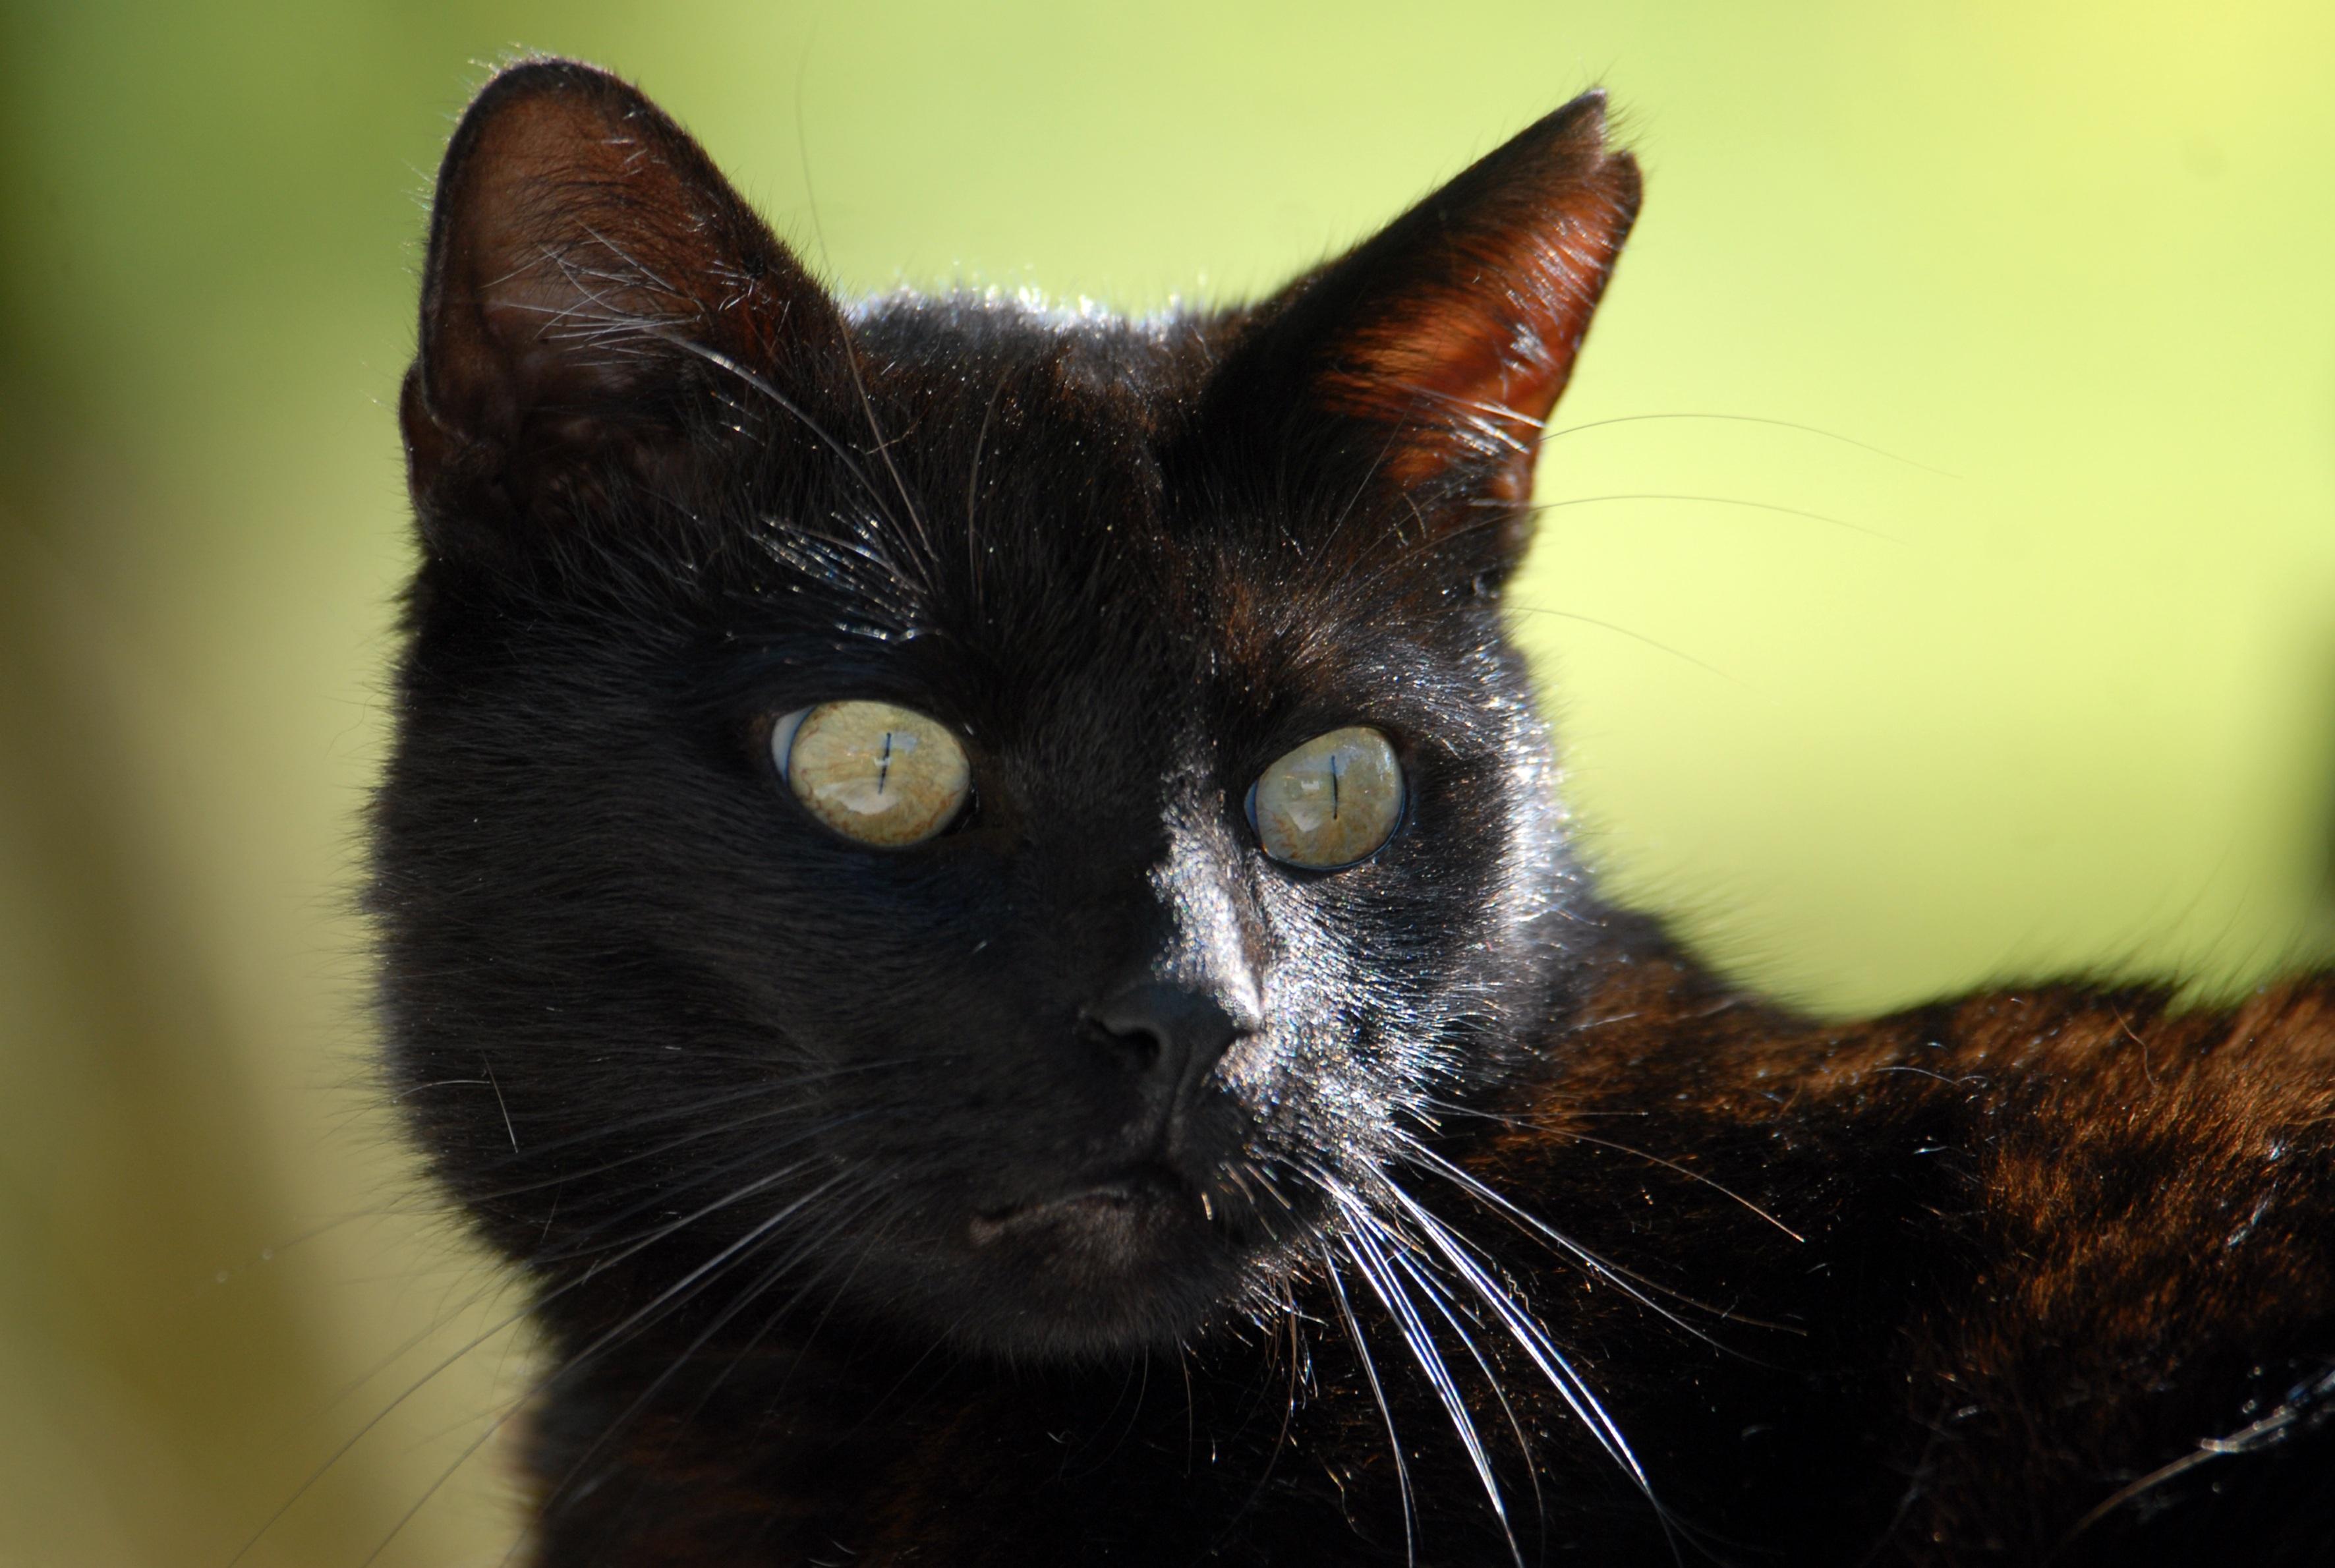 čierna mačička zblízka čierna mačička nad 30